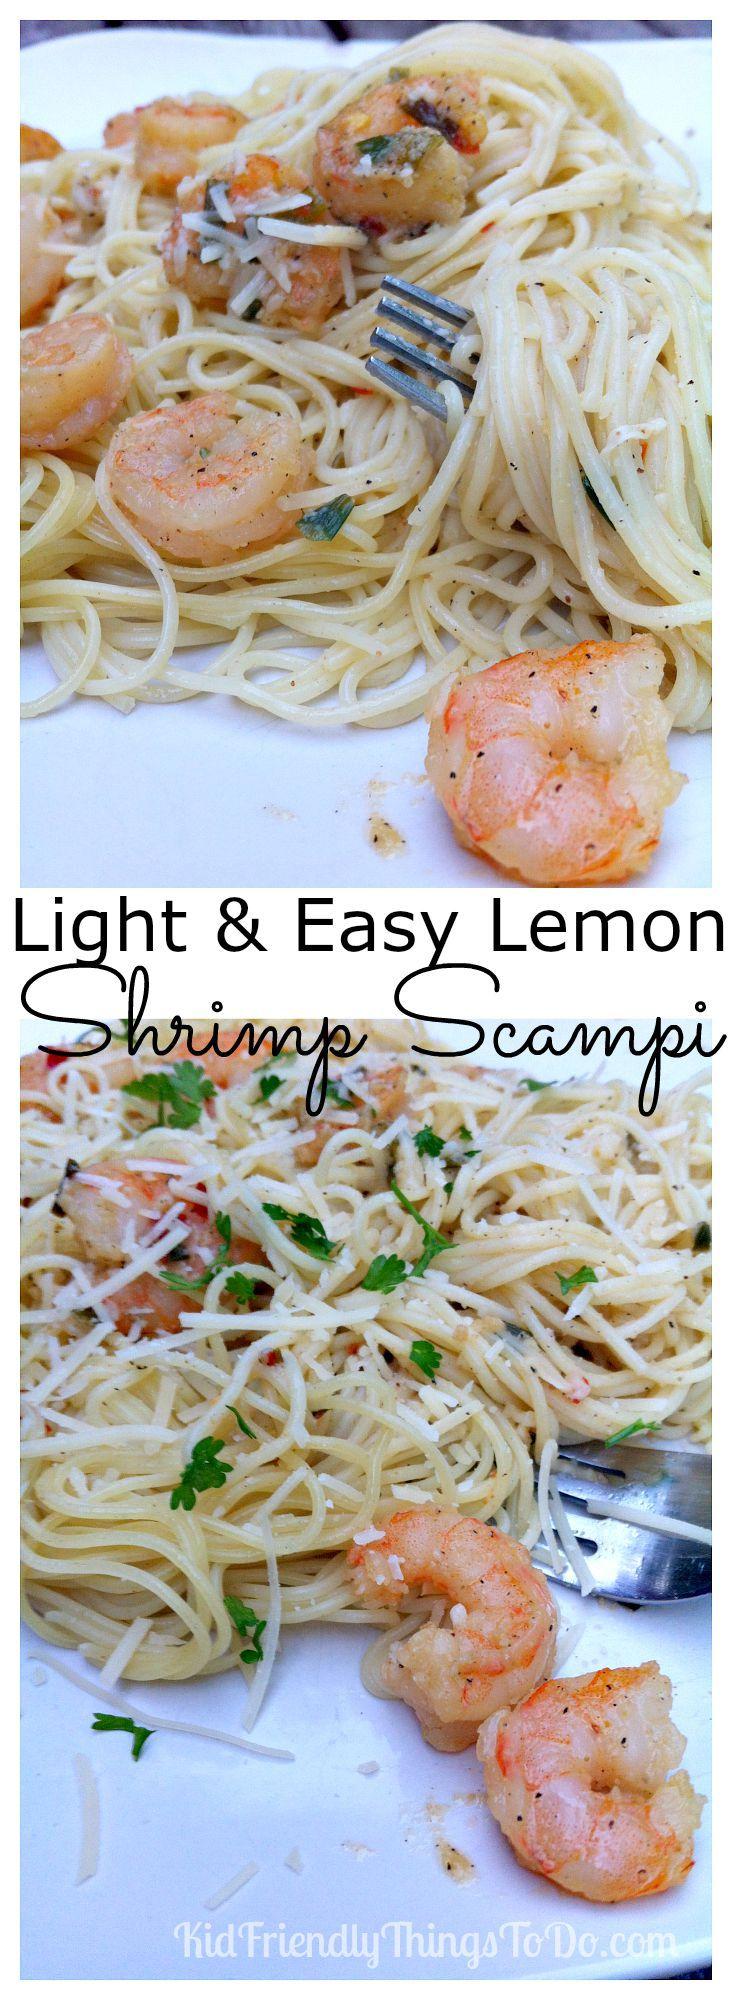 Easy Lemon Shrimp Scampi Recipe | Kid Friendly Things to Do.com - Family Recipes, Crafts, and Fun Foods